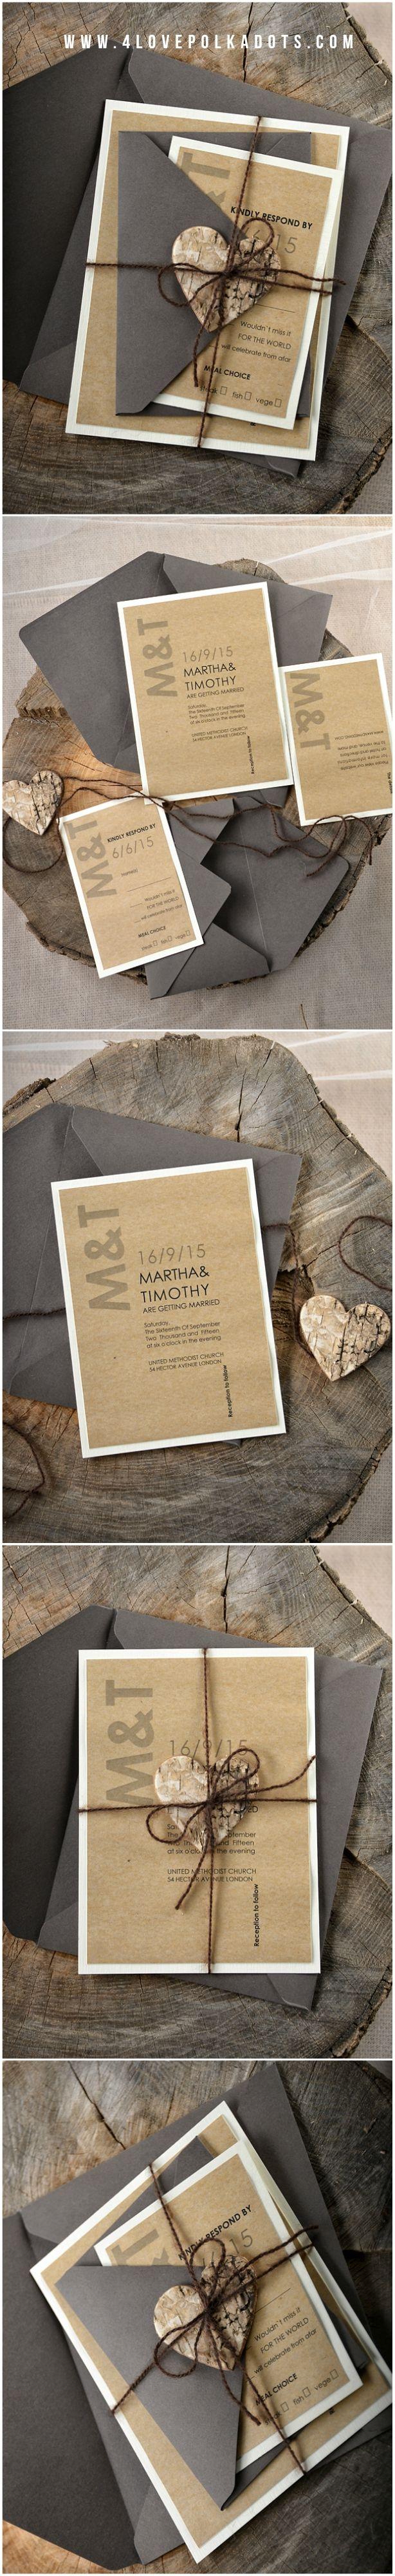 Eco Kraft Black U0026 Brown Calligraphy Wedding Invitations With Birch Bark  Wooden Heart Tag #modern